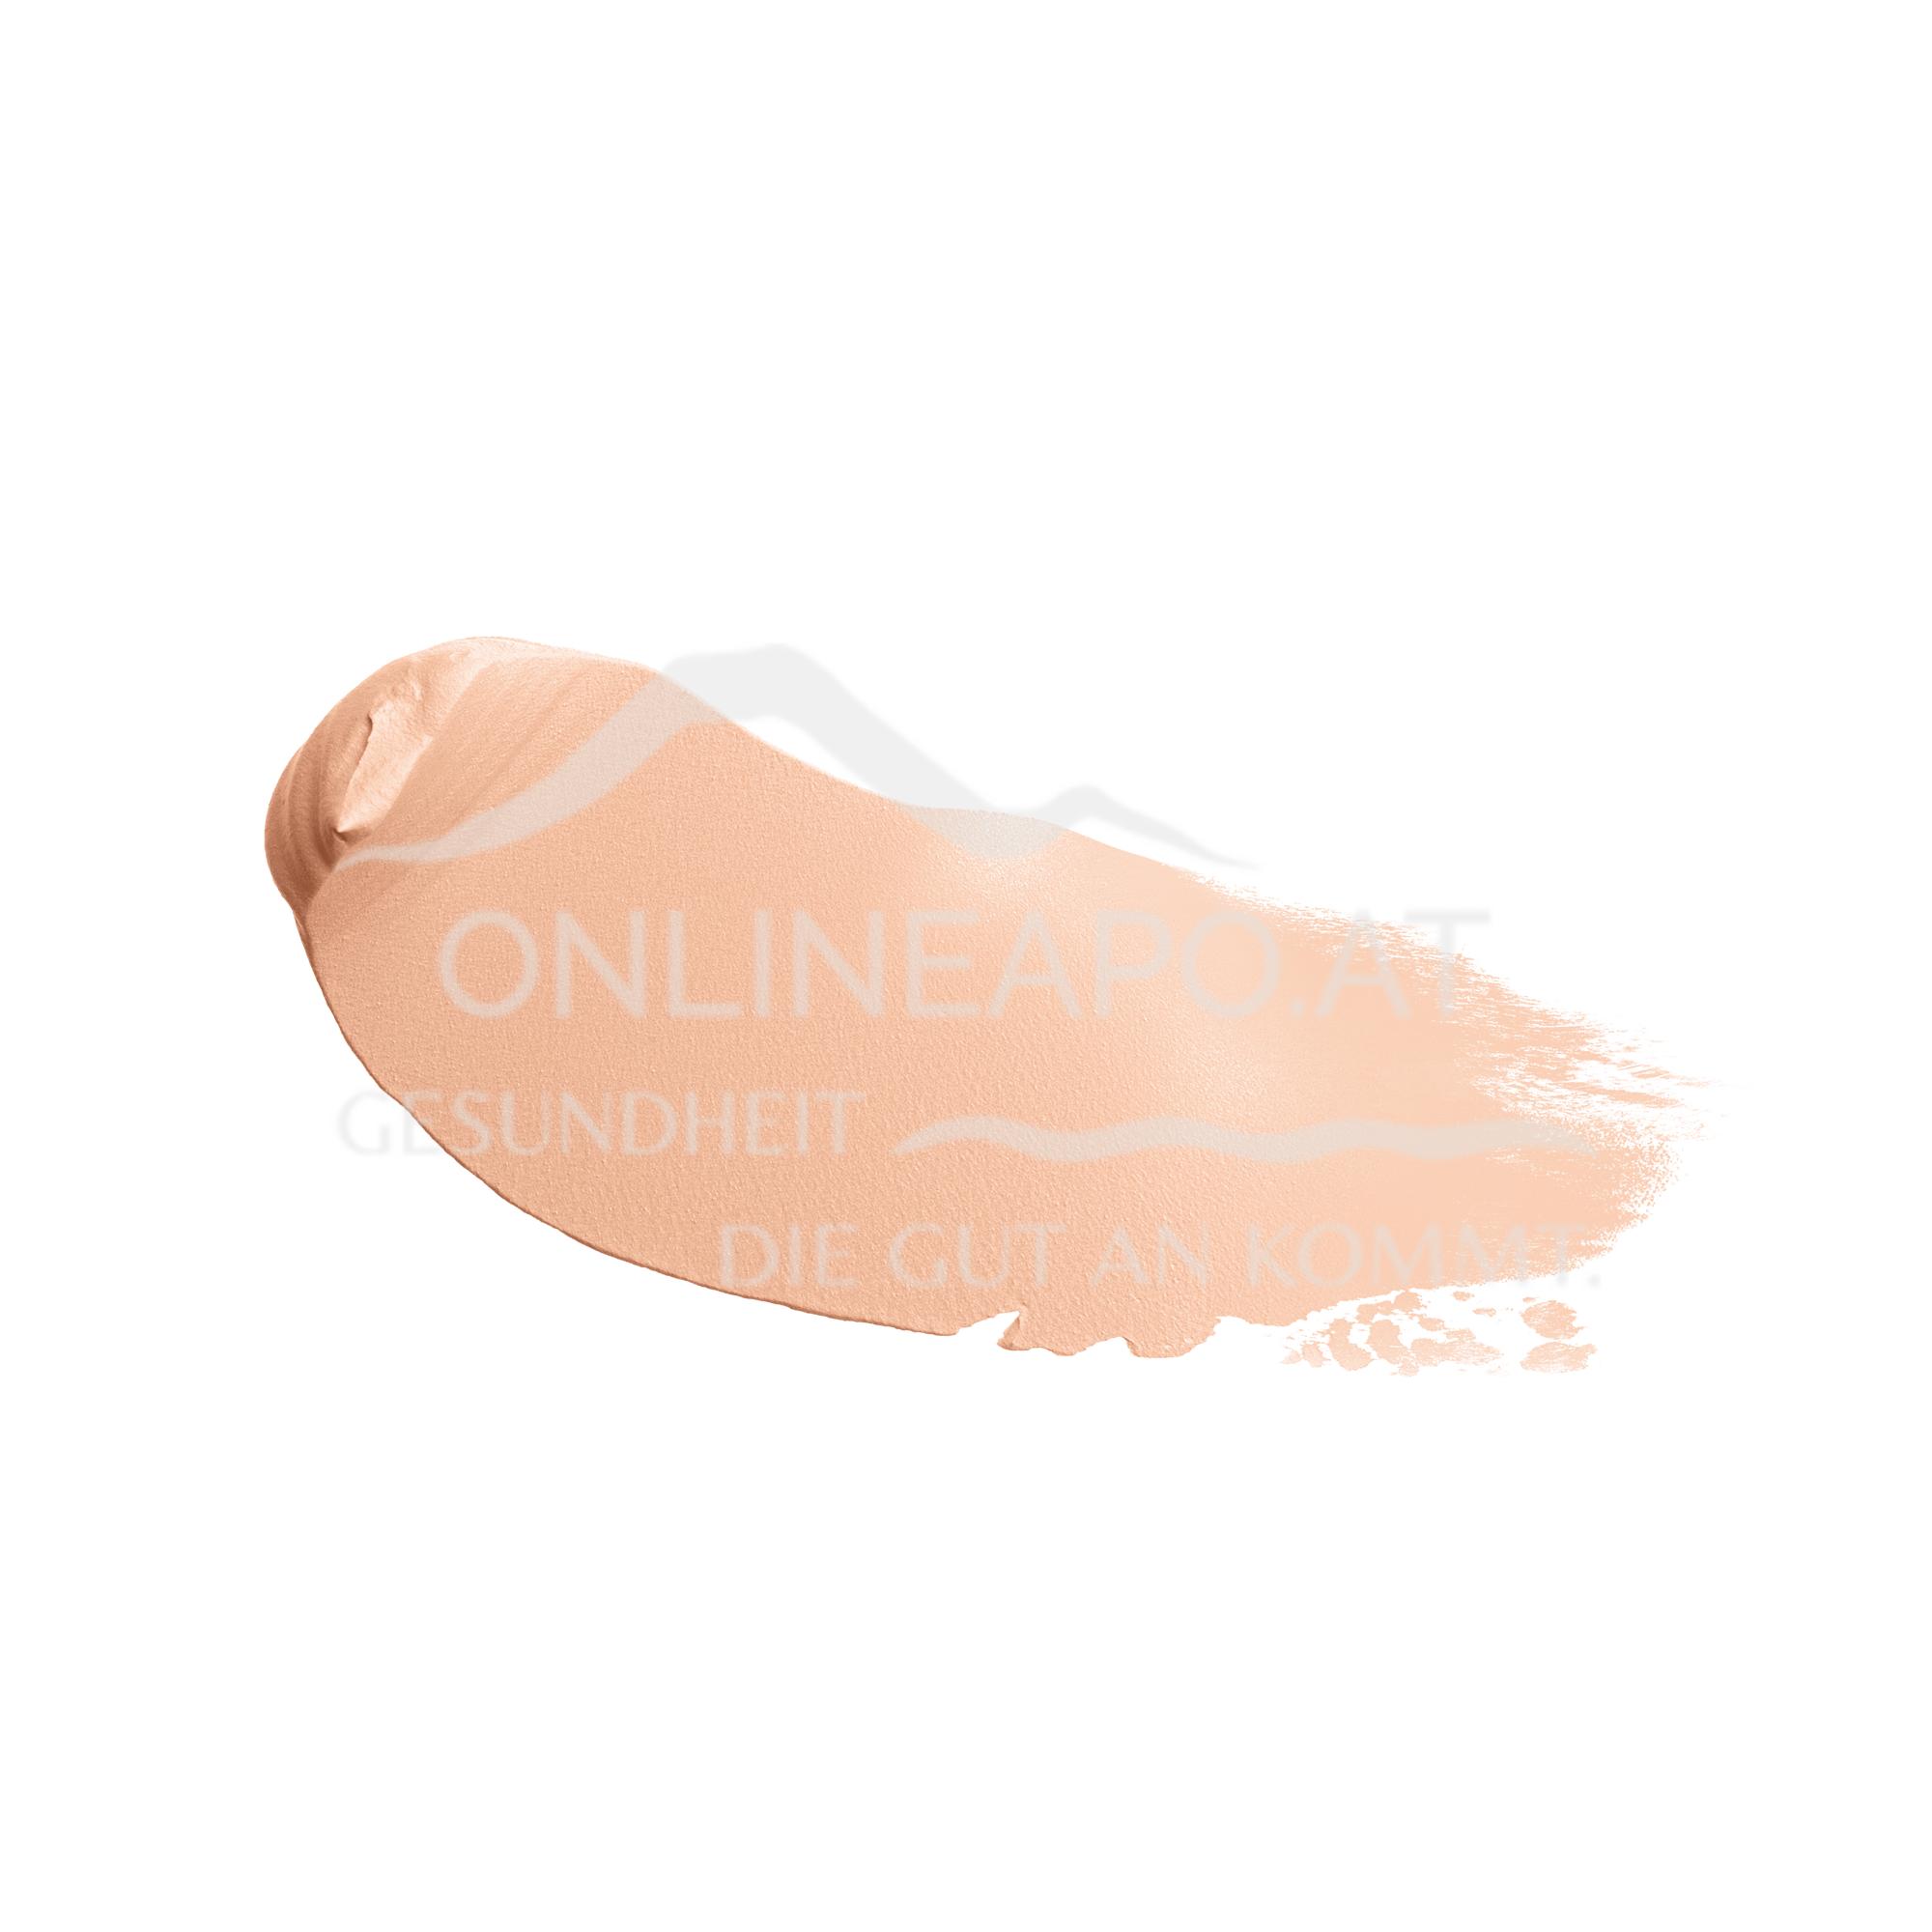 VICHY Dermablend 3D Make-Up 20 - Vanilla